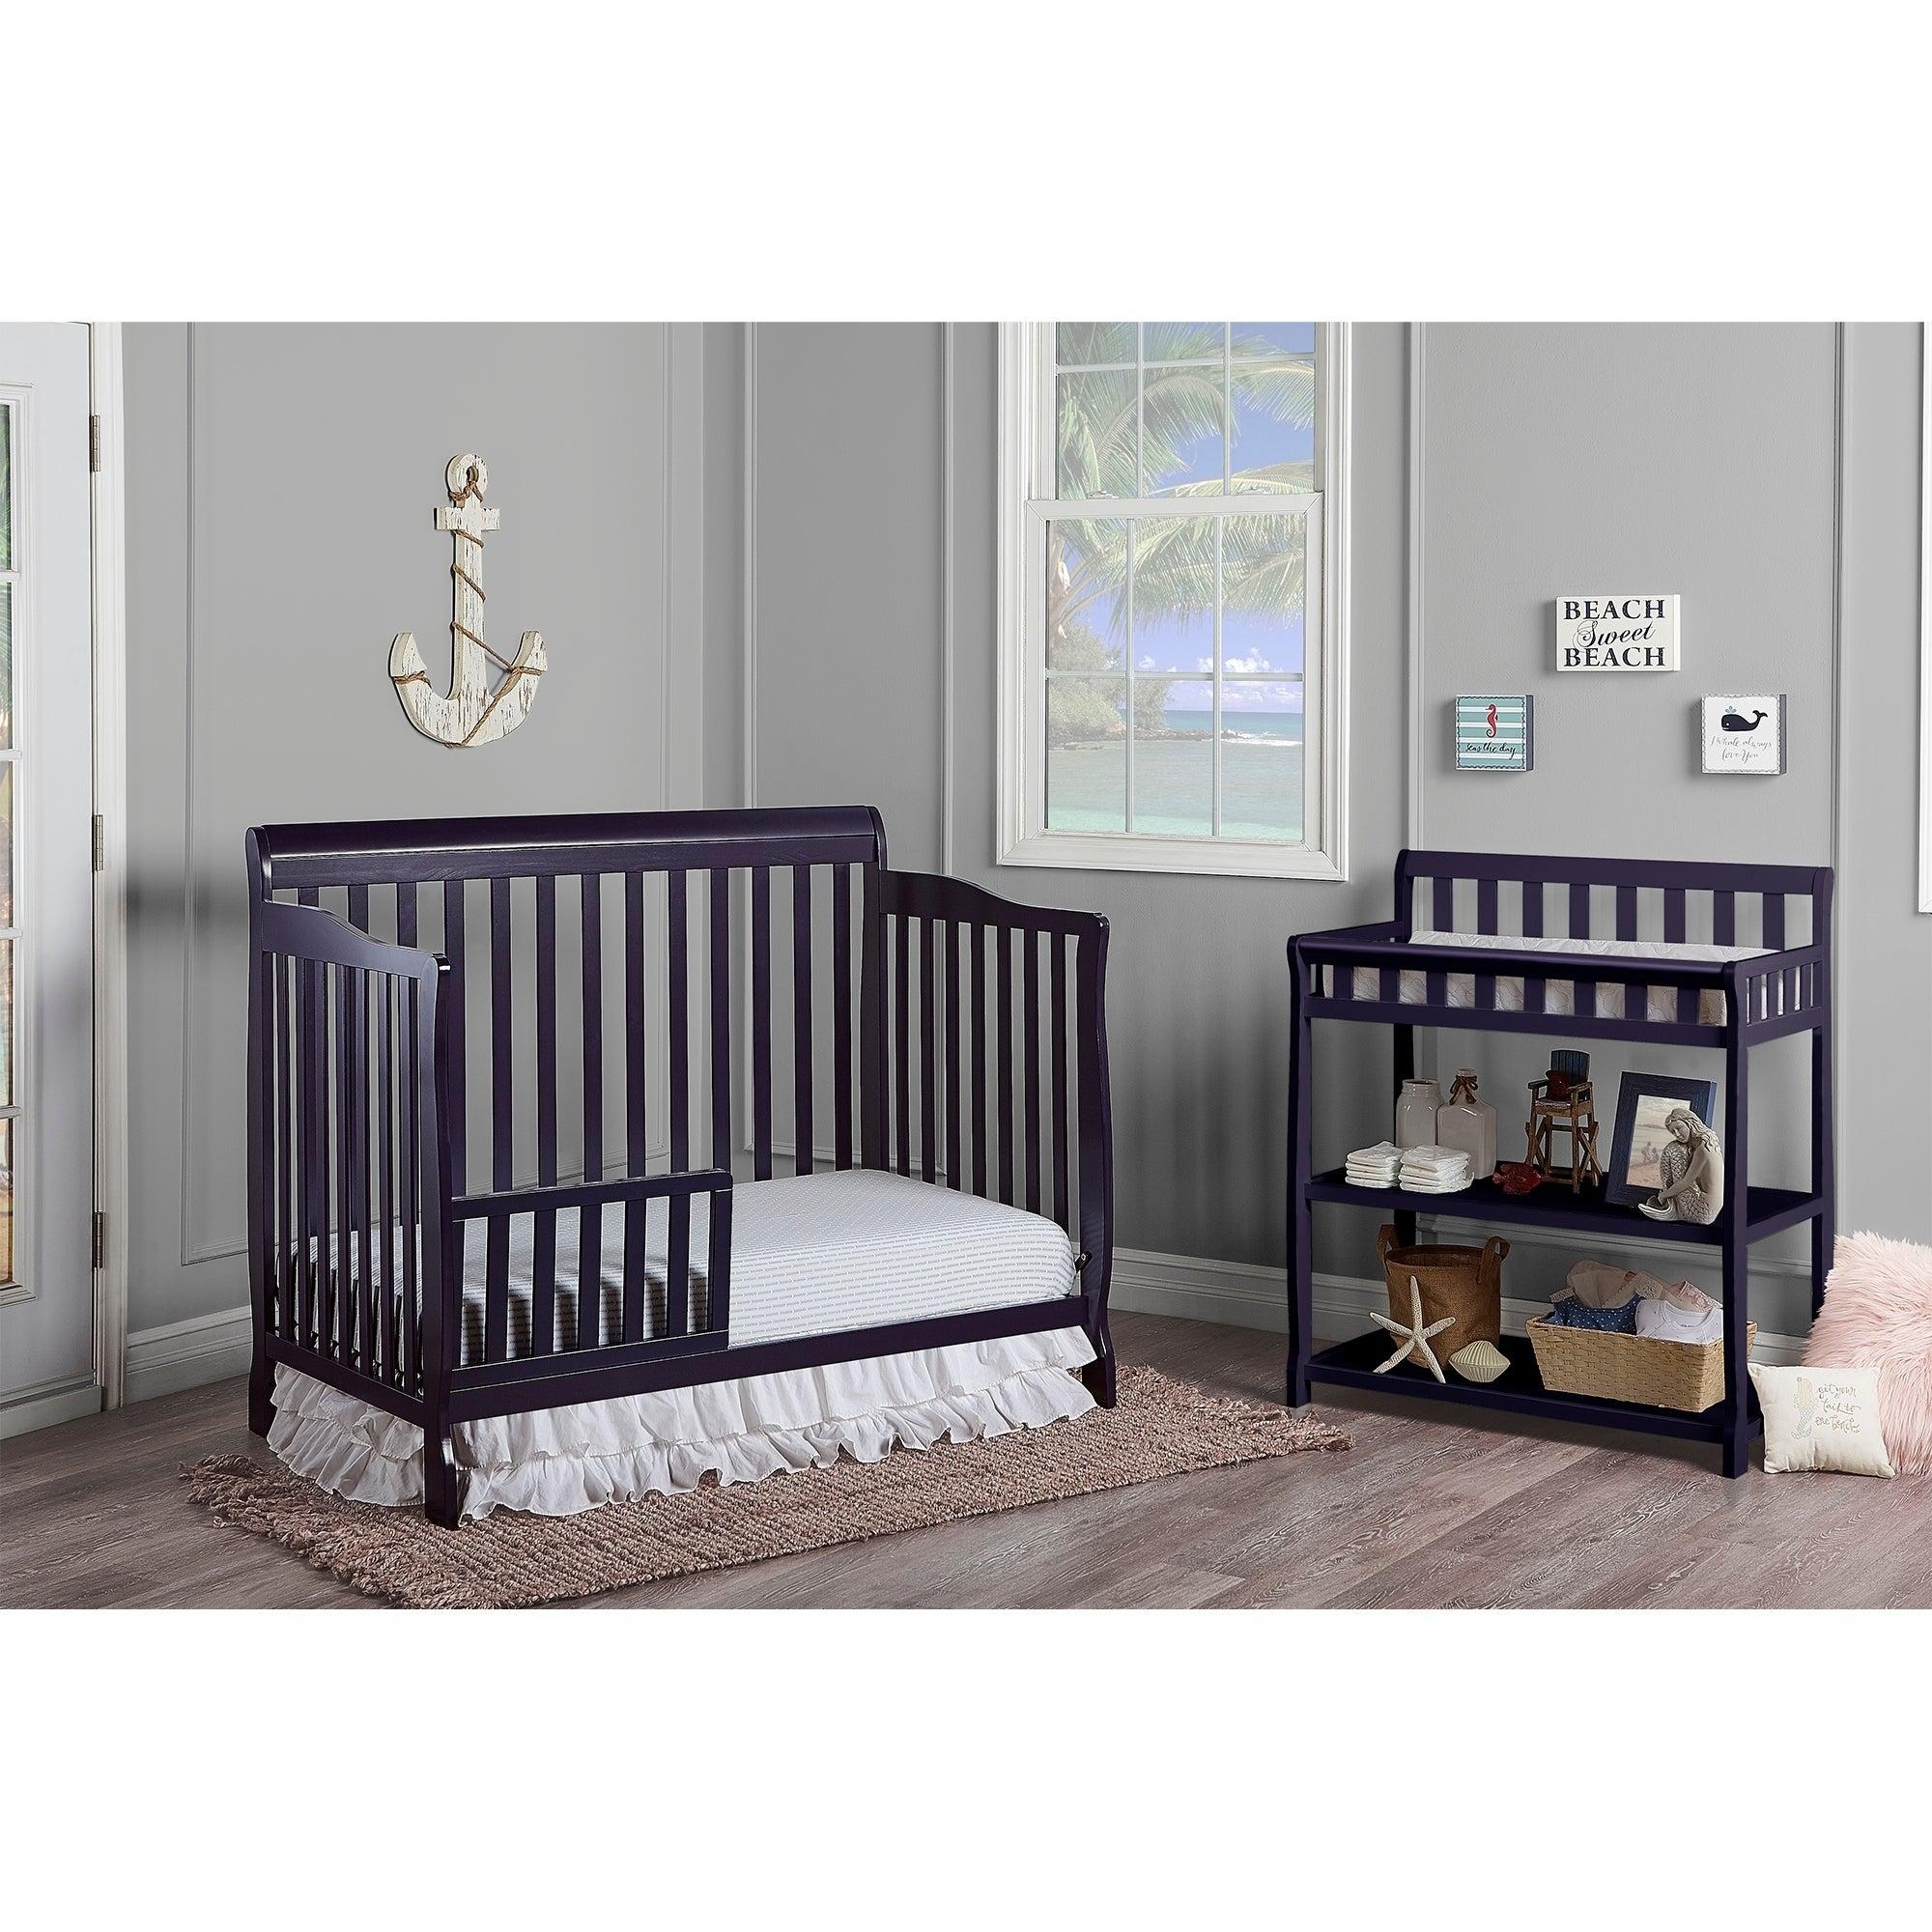 0020e236ea1 Shop Dream On Me Ashton 5-in-1 Convertible Crib - Free Shipping ...